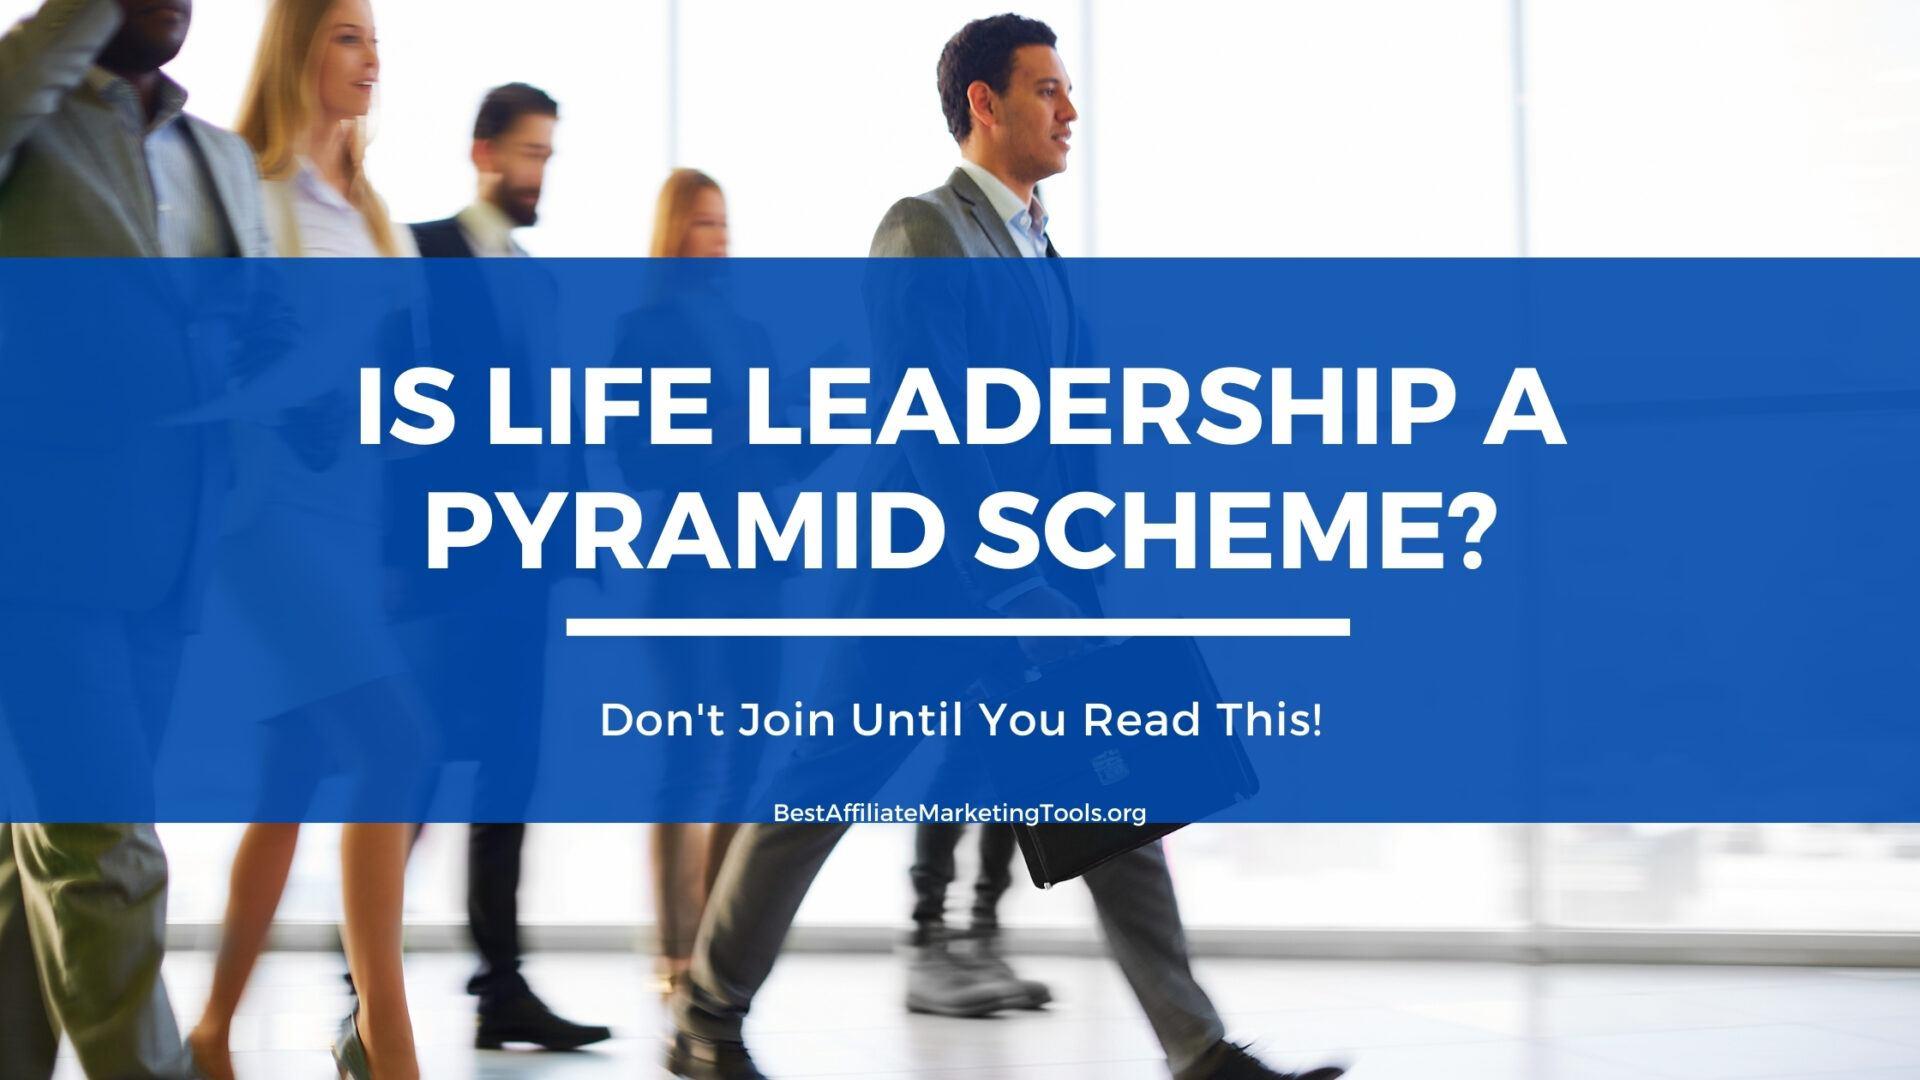 Is Life Leadership a Pyramid Scheme